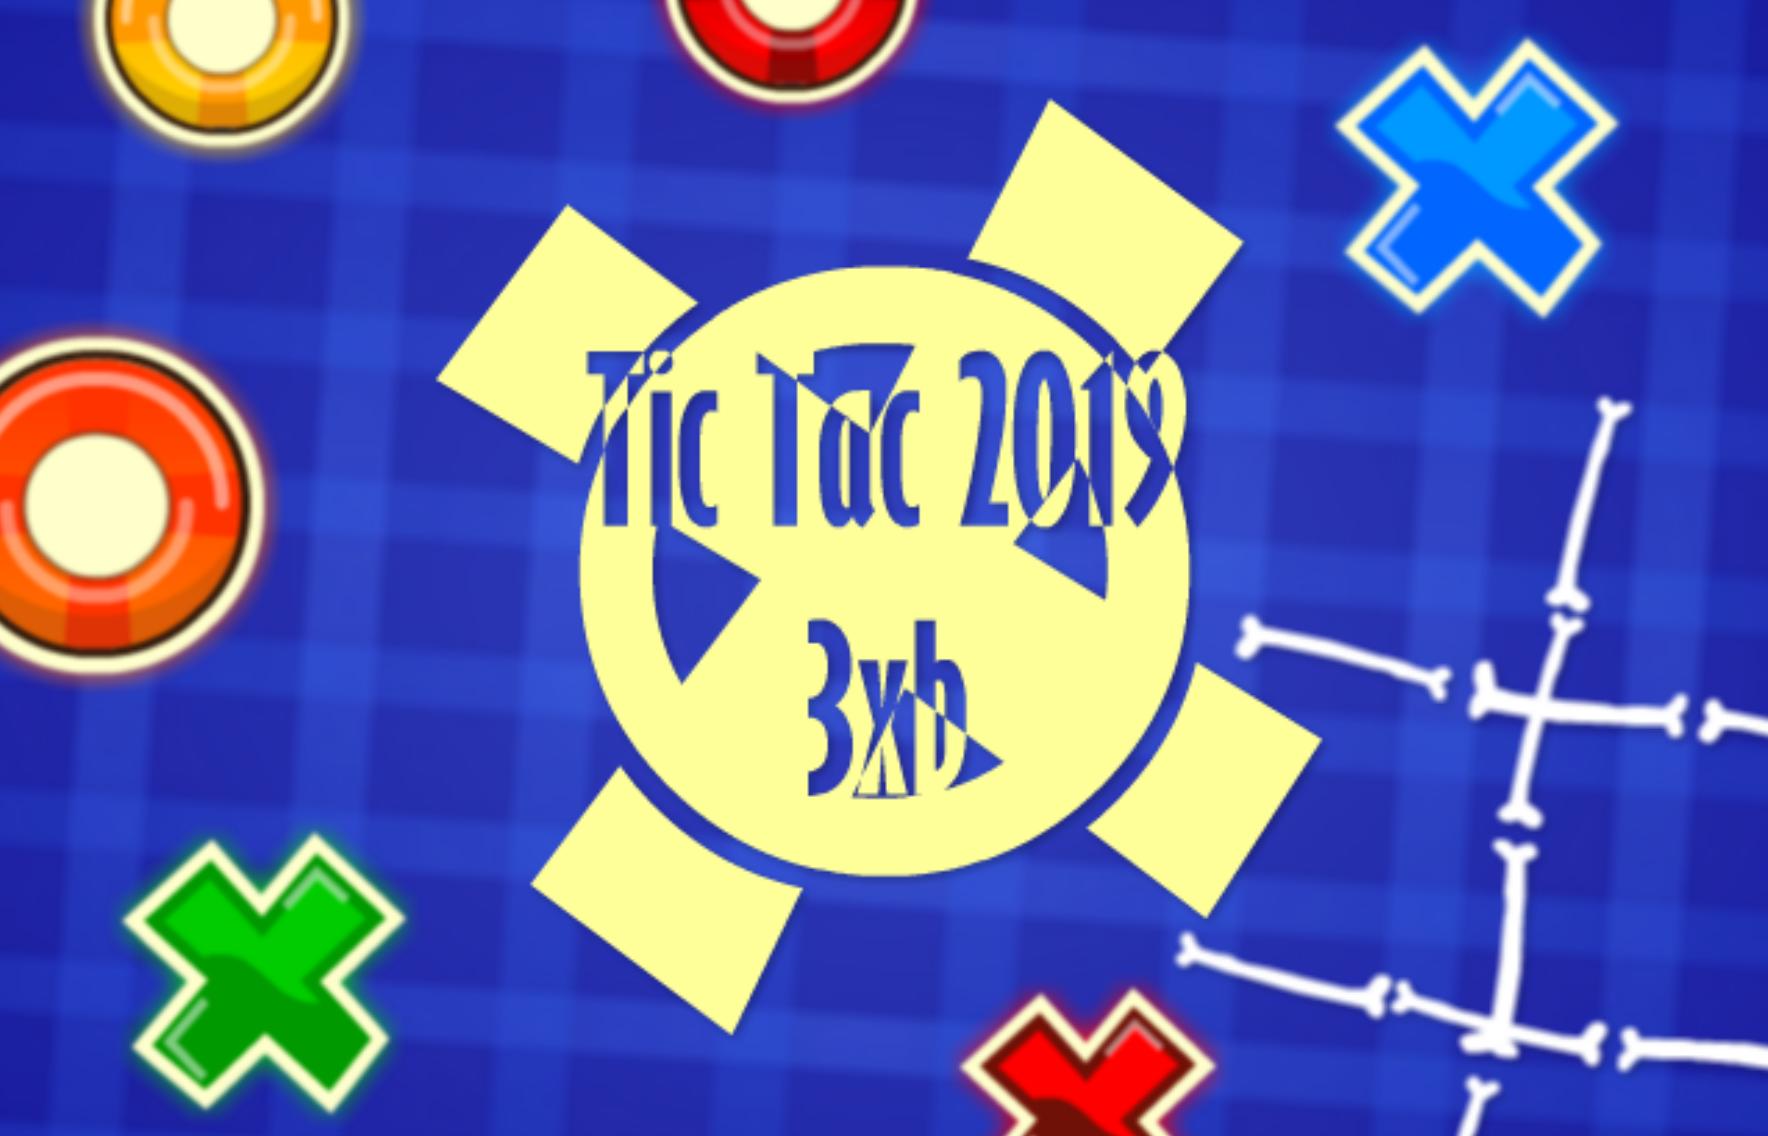 Tic Tac 2019 3xb